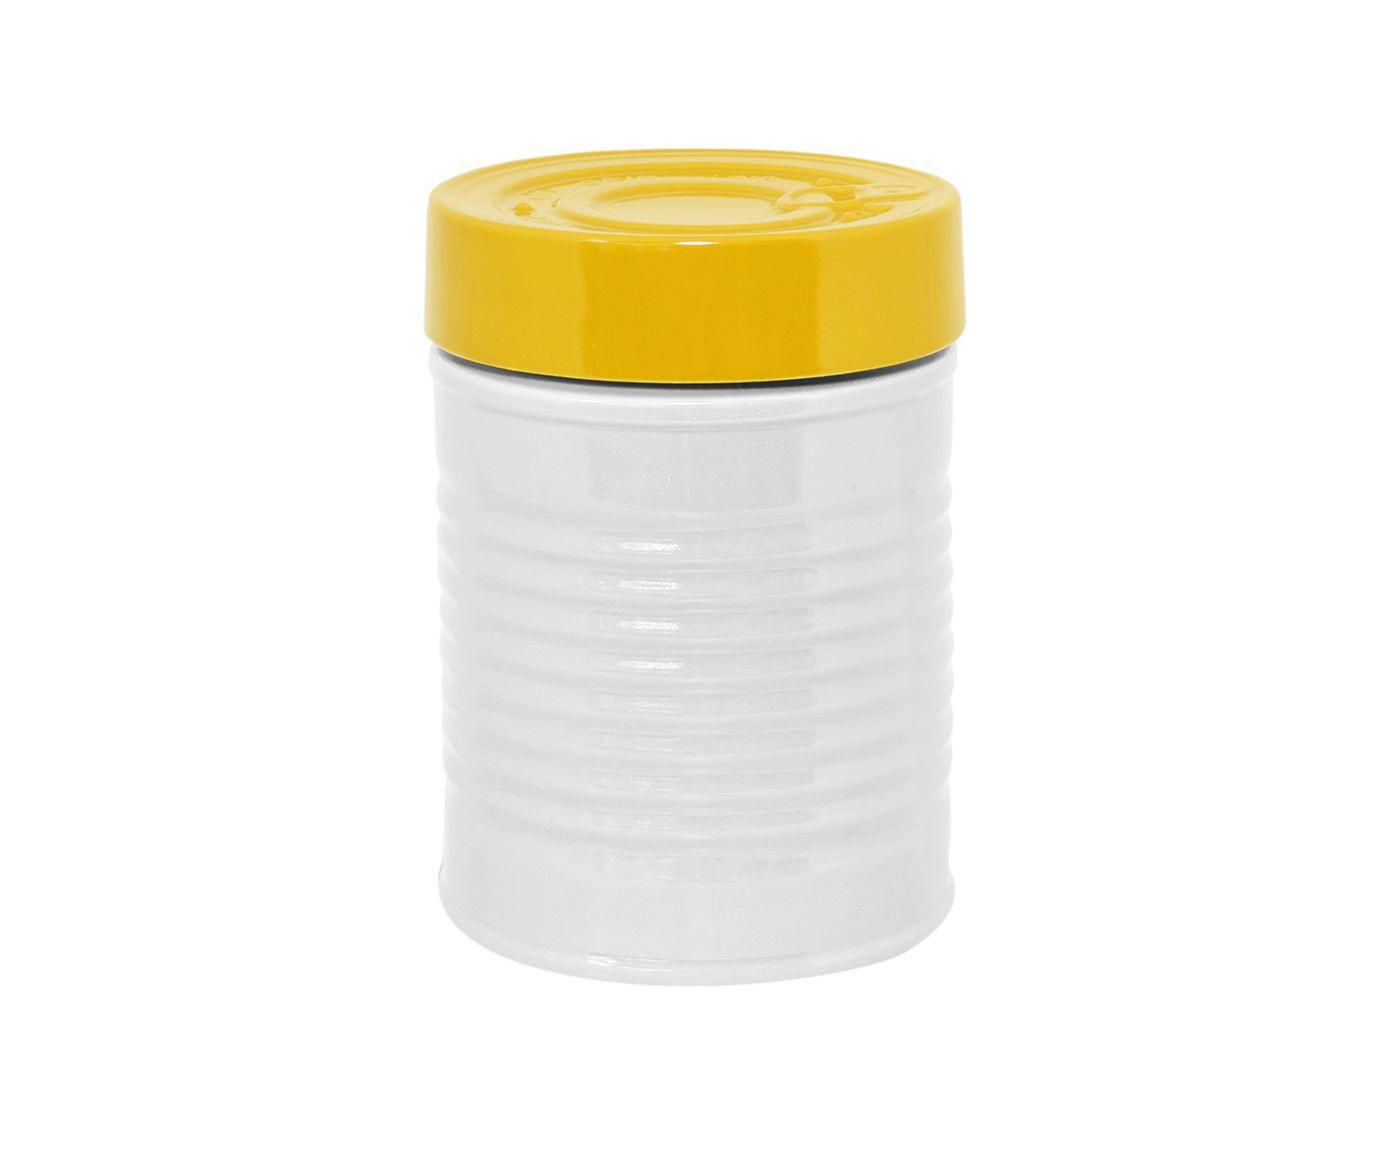 Pote Can Lata Amarelo e Branco - 900ml | Westwing.com.br